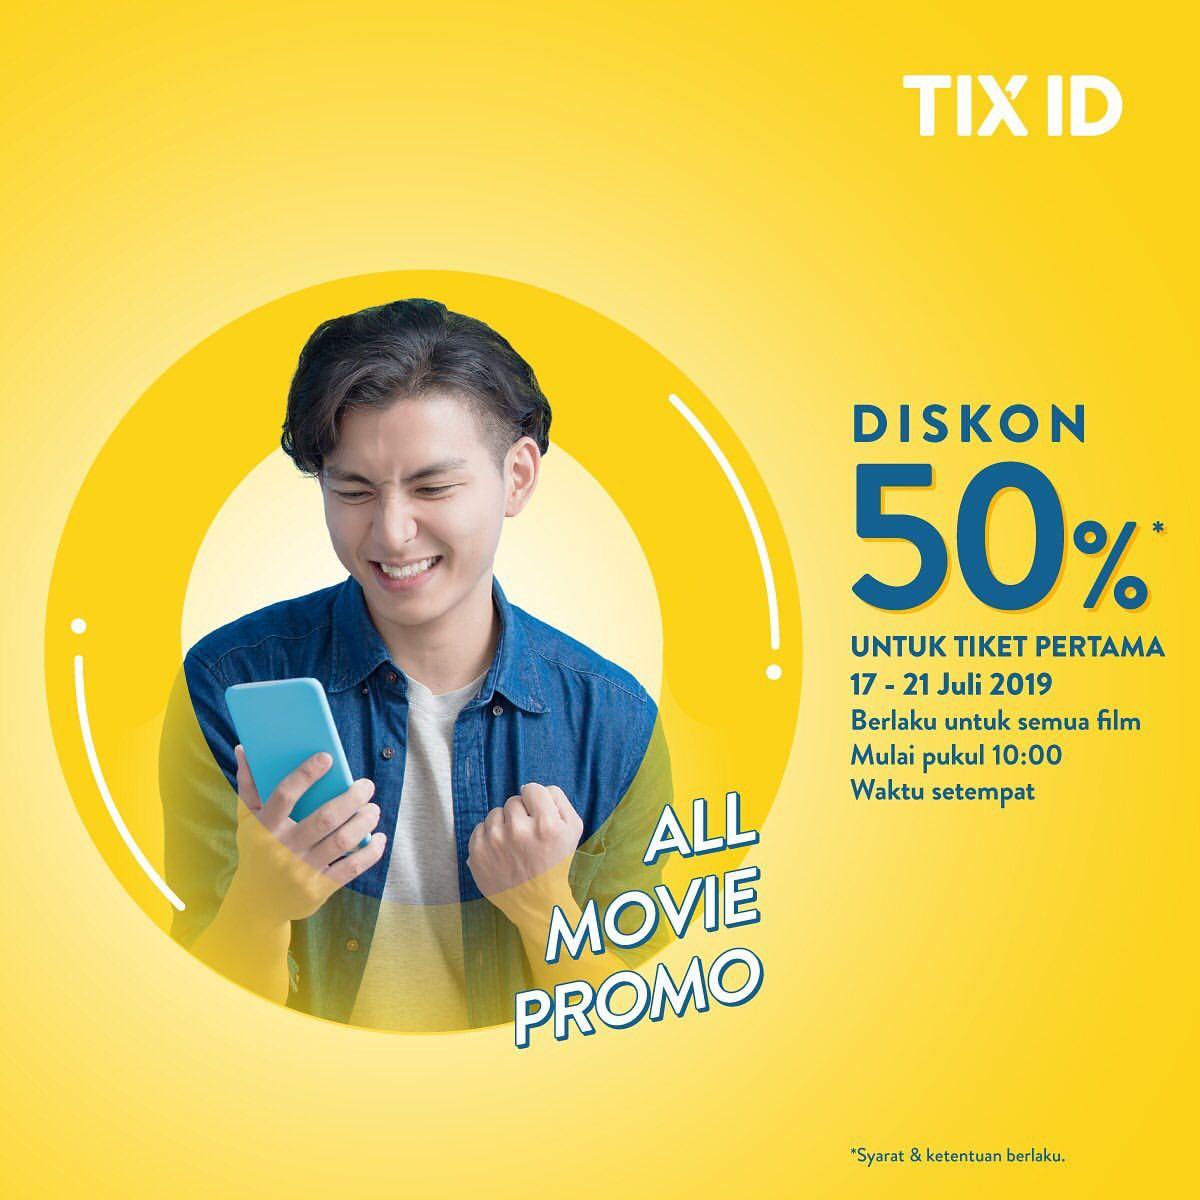 Diskon TIX.ID Promo Diskon 50% Untuk Tiket Pertama Semua Film